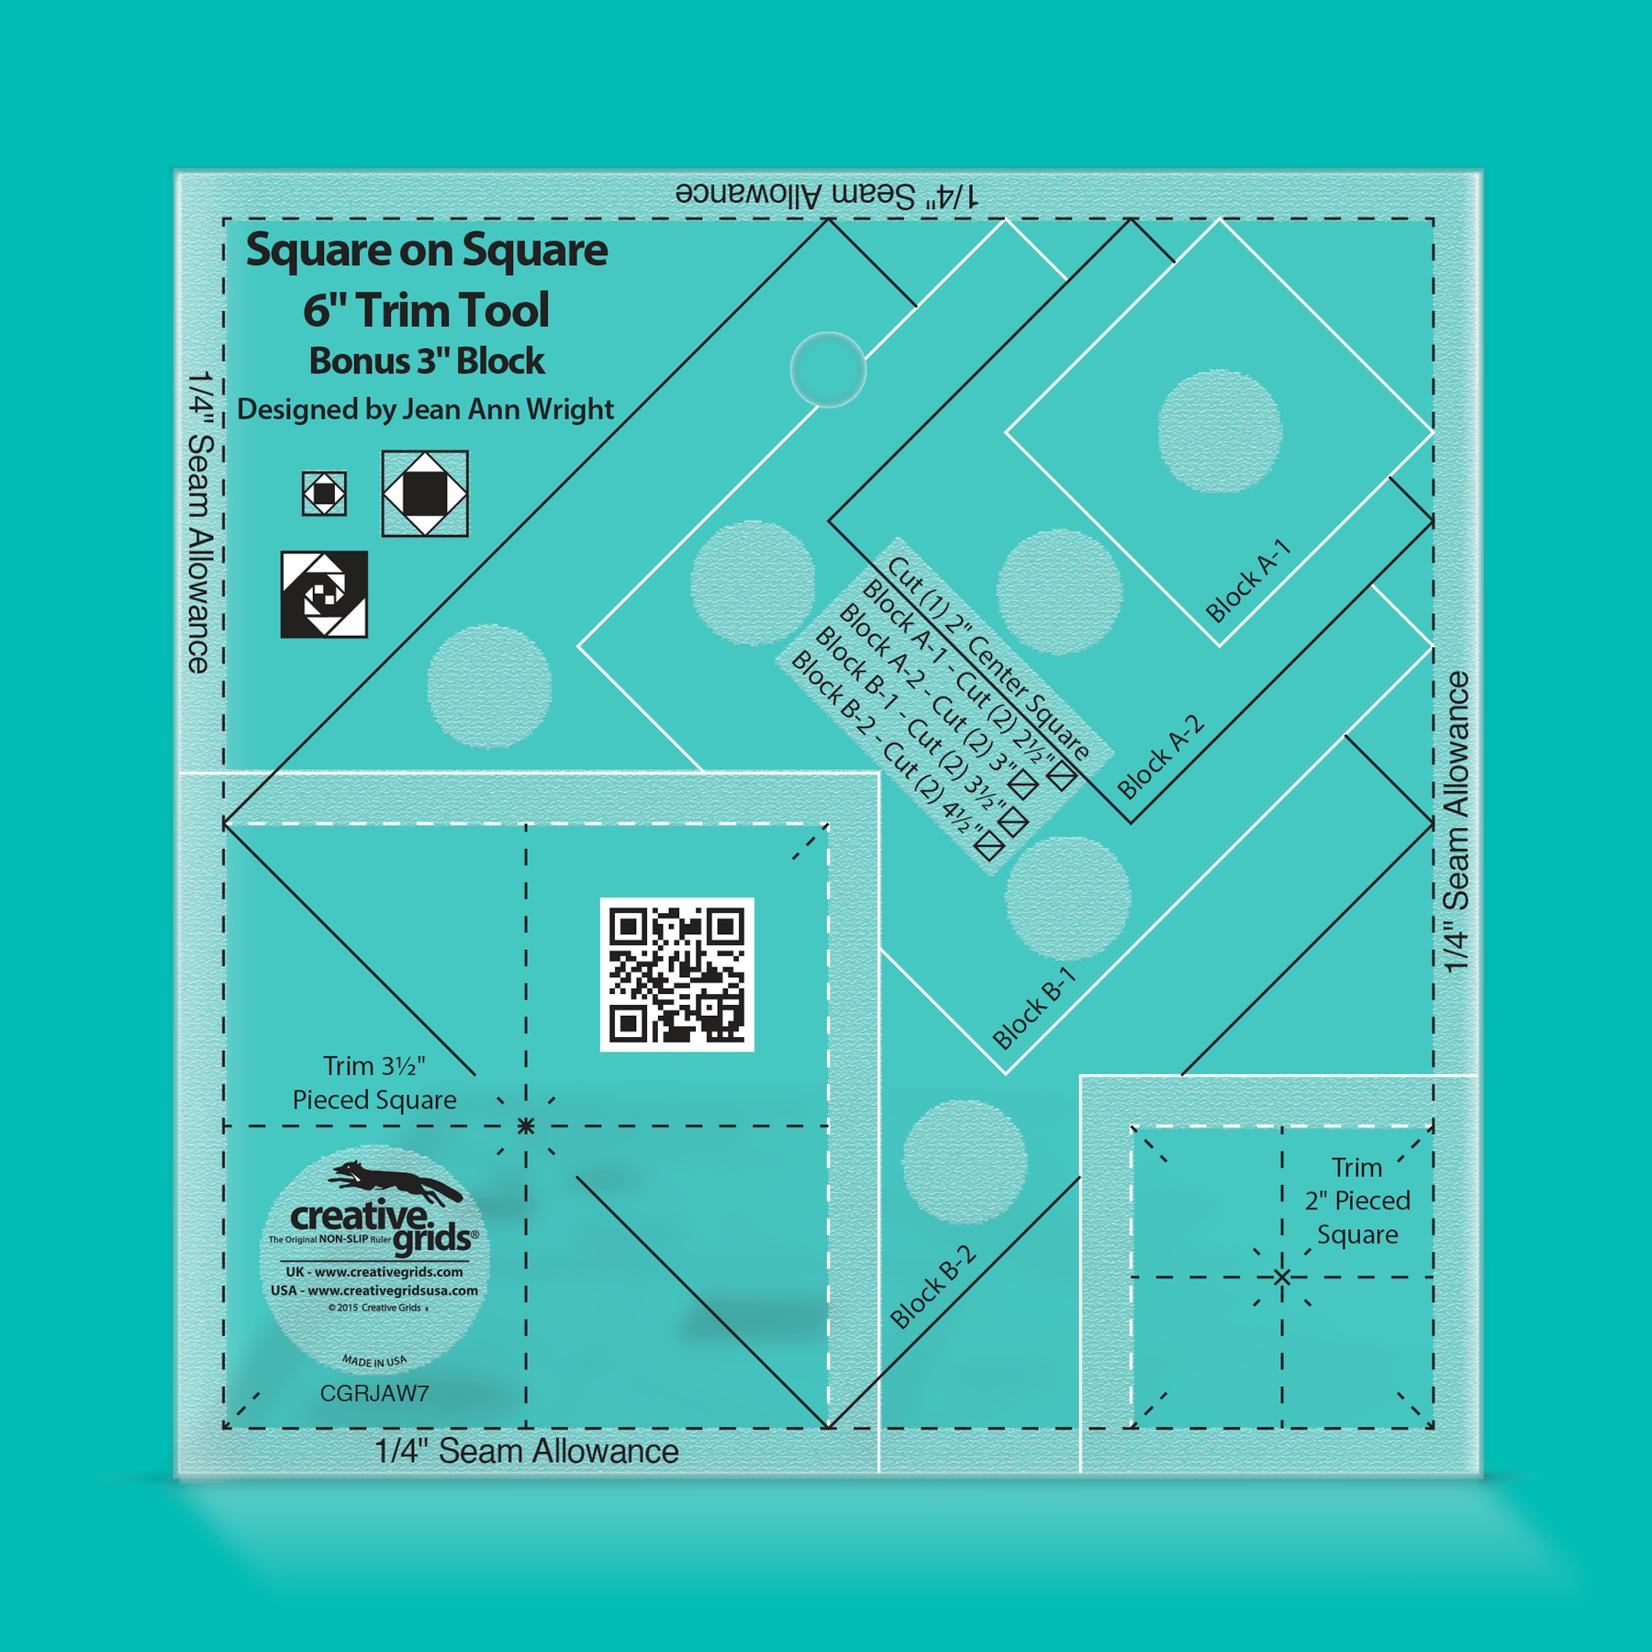 "Creative Grids Creative Grids 6"" Square on Square Trim Tool CGRJAW7"